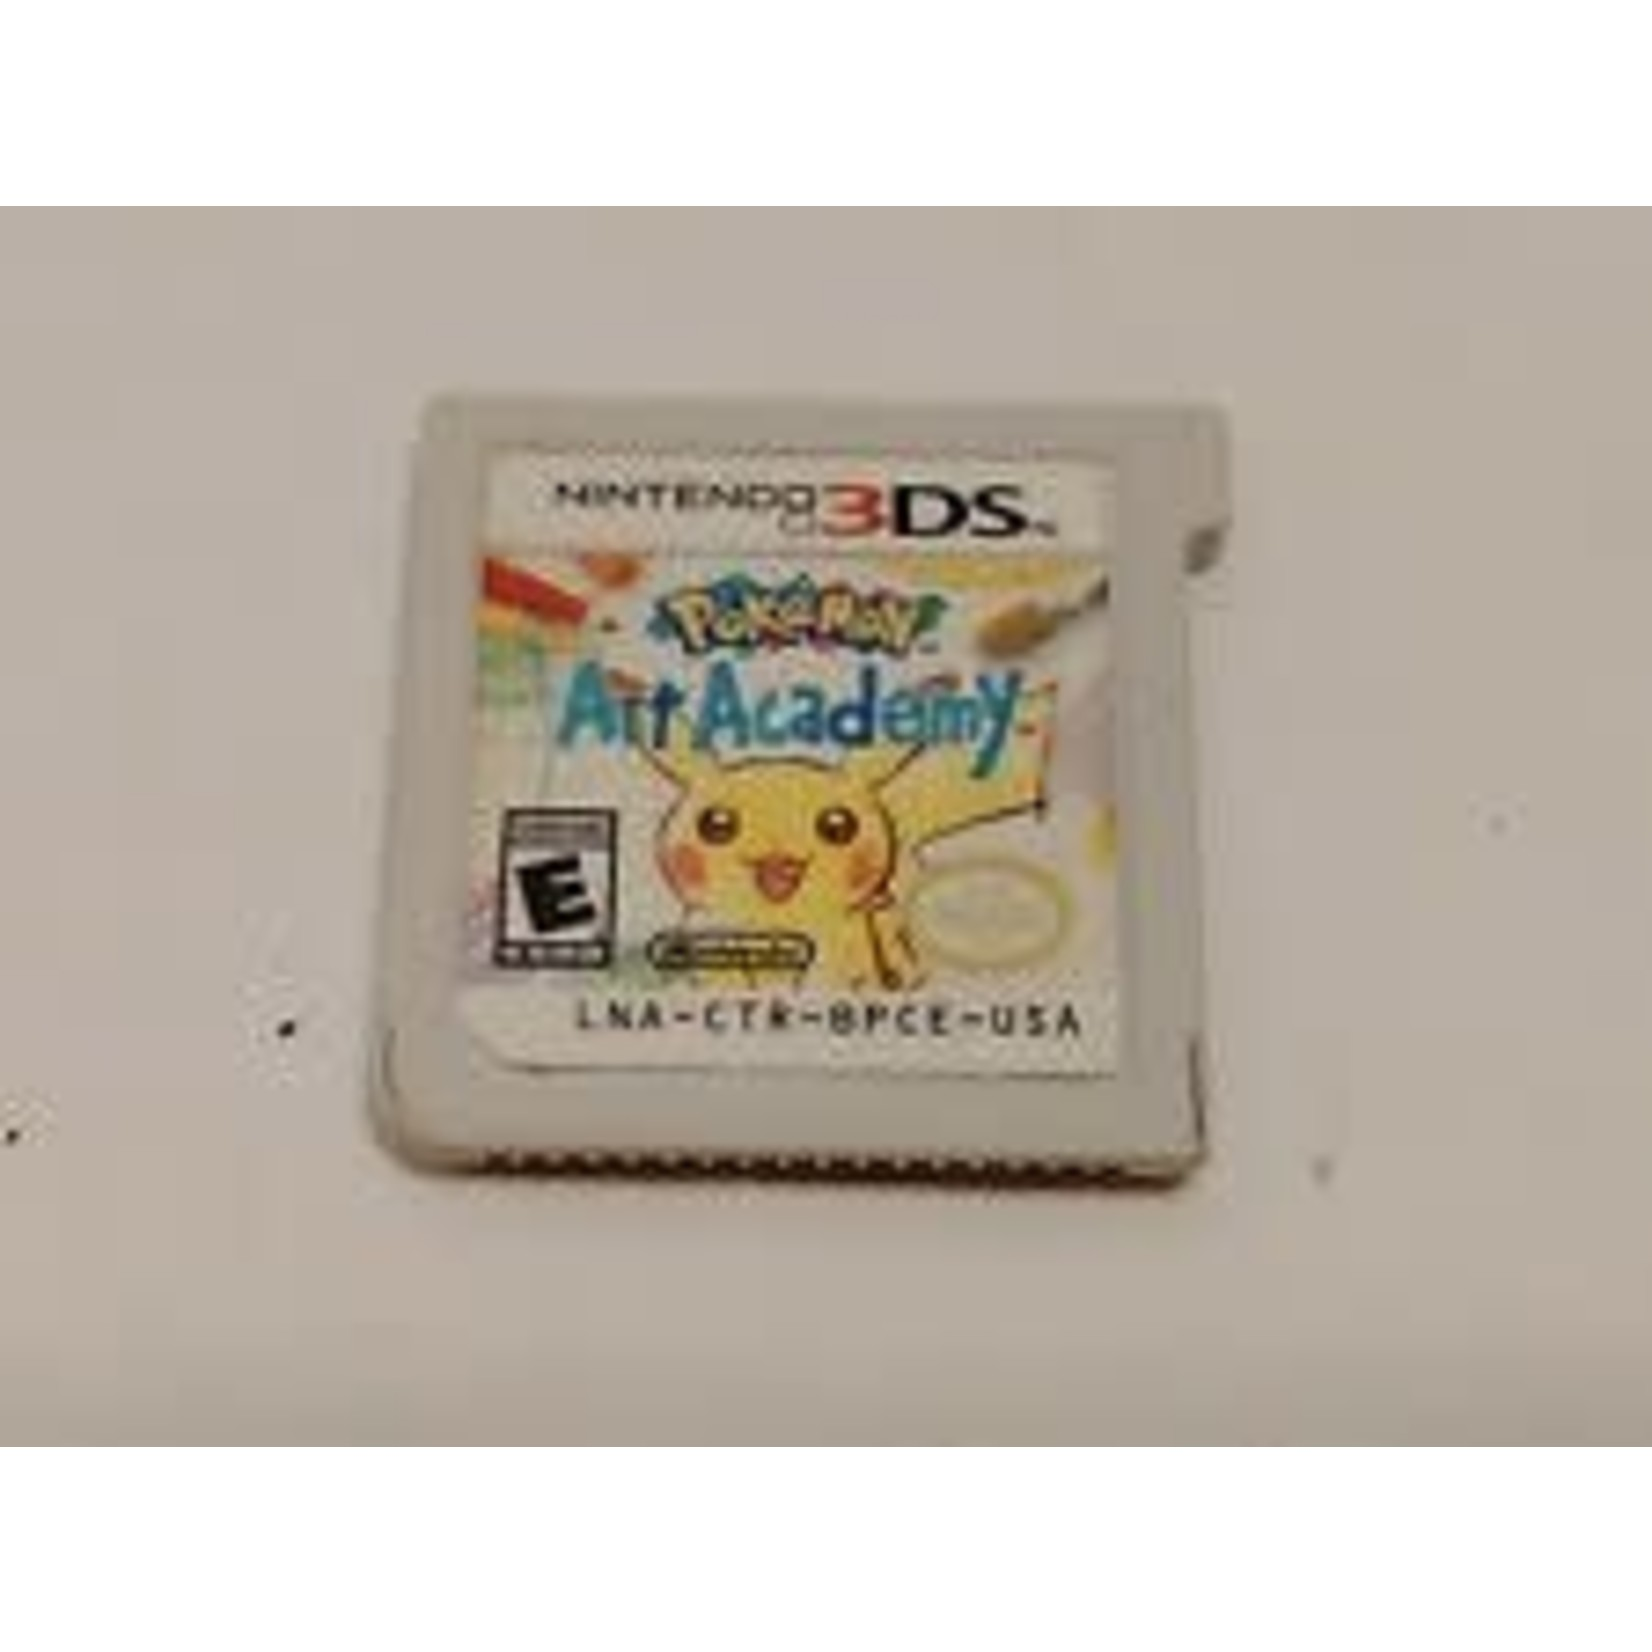 3dsu-Pokemon Art Academy (chip only)